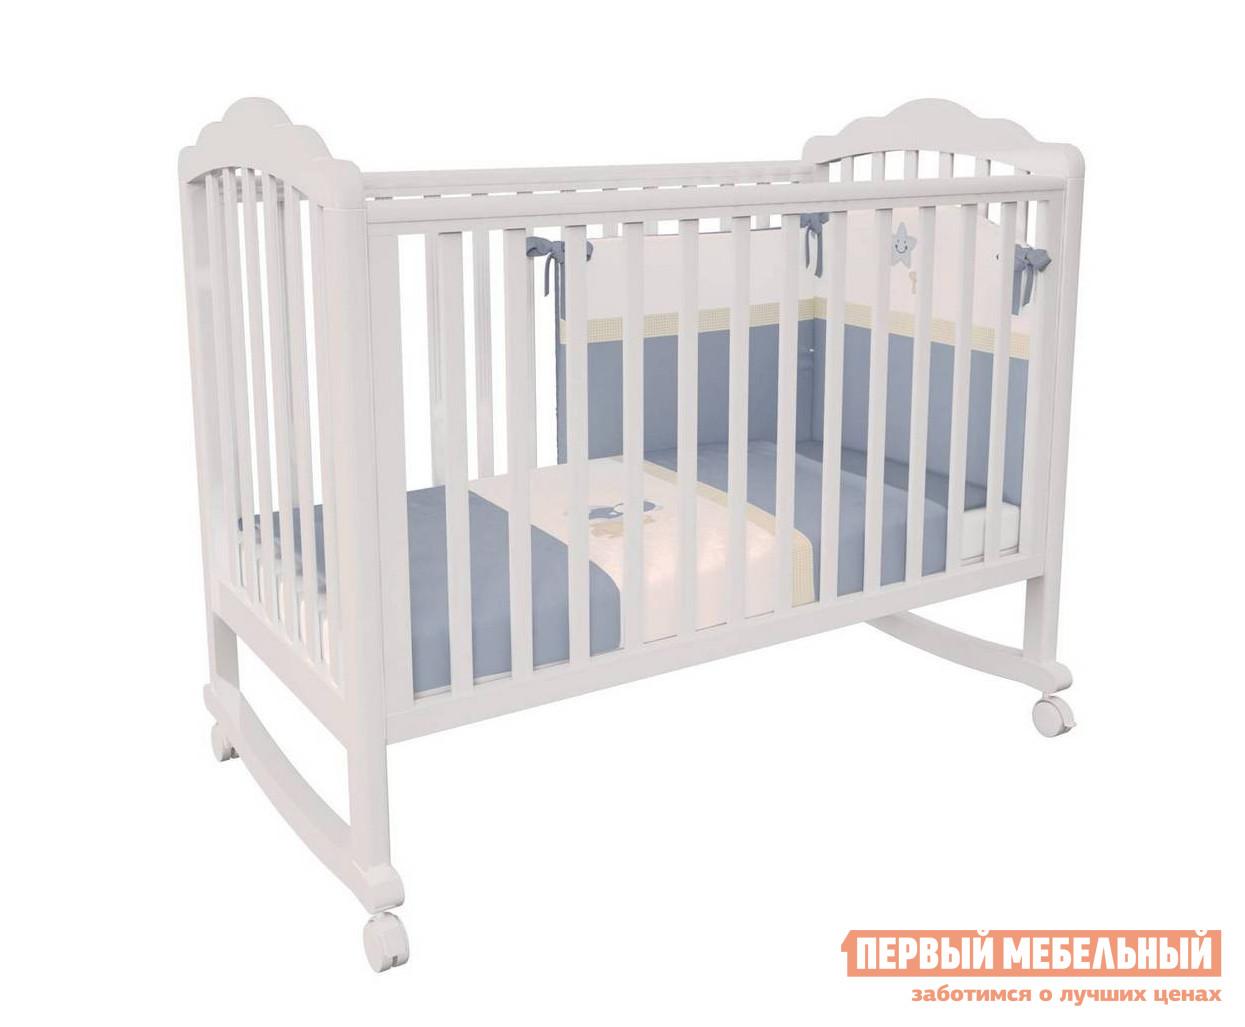 Кроватка ВПК Кроватка детская Polini kids Classic 621 кроватка трансформер polini polini kids simple 1100 с комодом